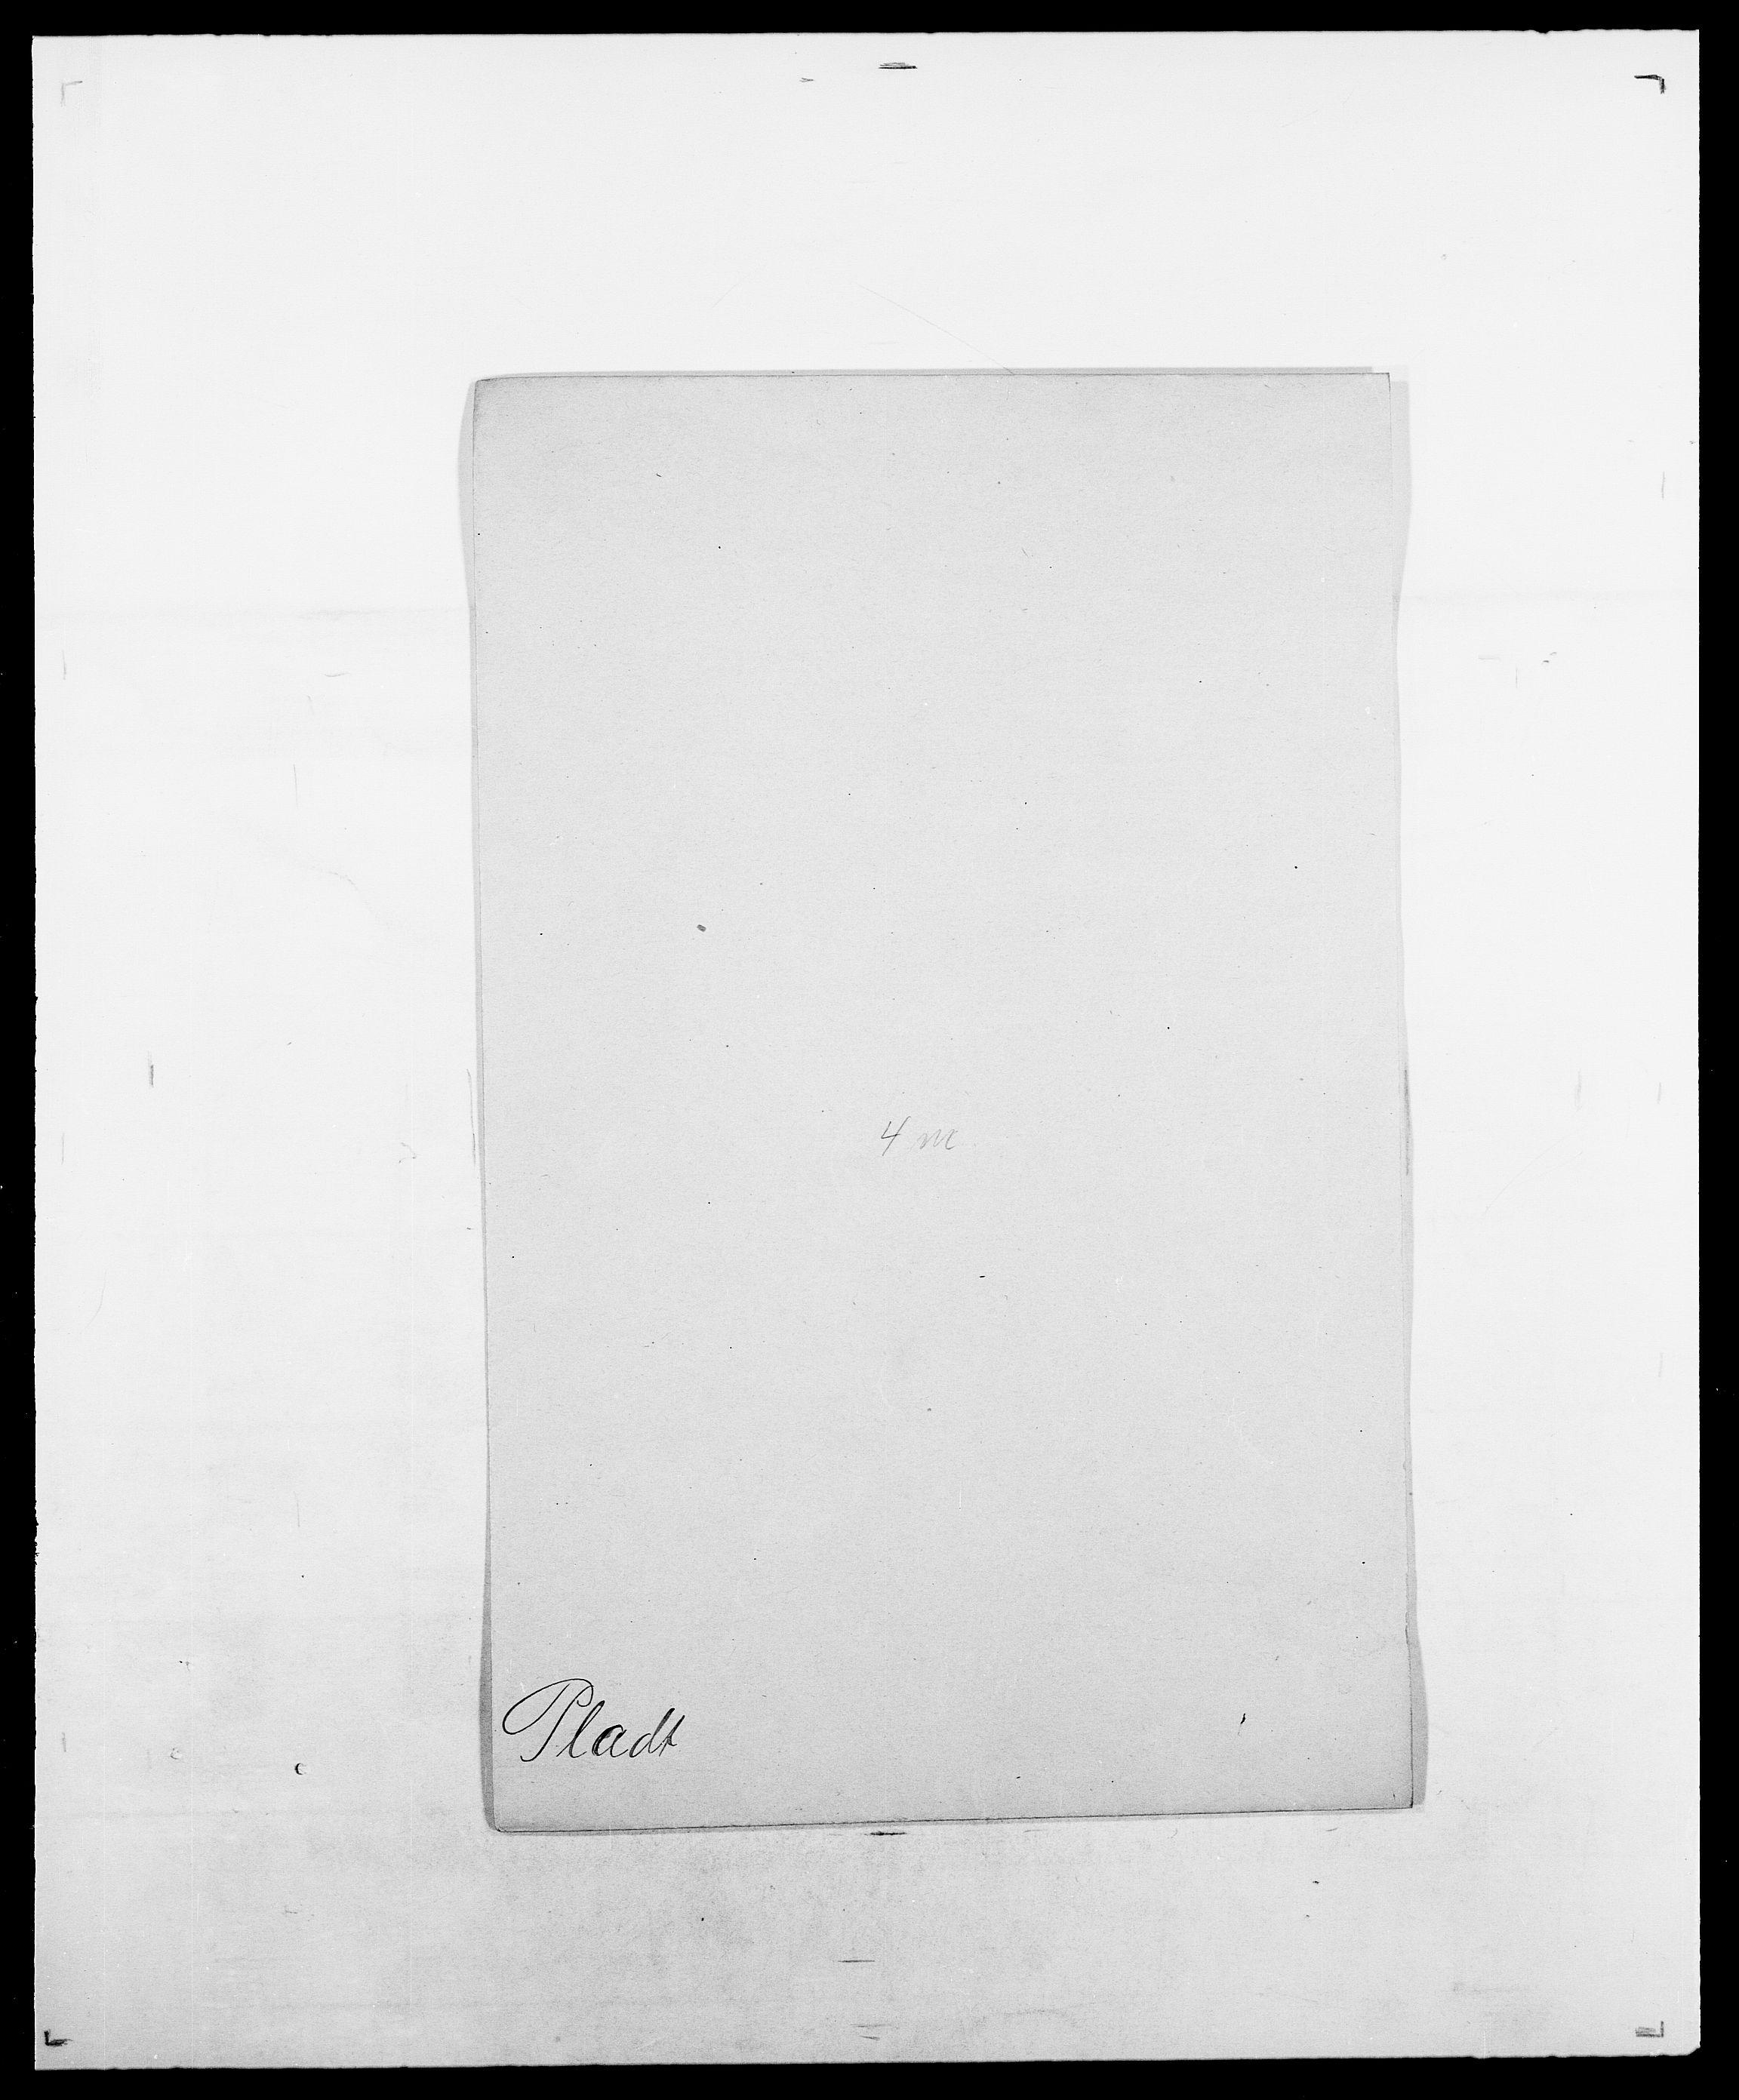 SAO, Delgobe, Charles Antoine - samling, D/Da/L0031: de Place - Raaum, s. 14